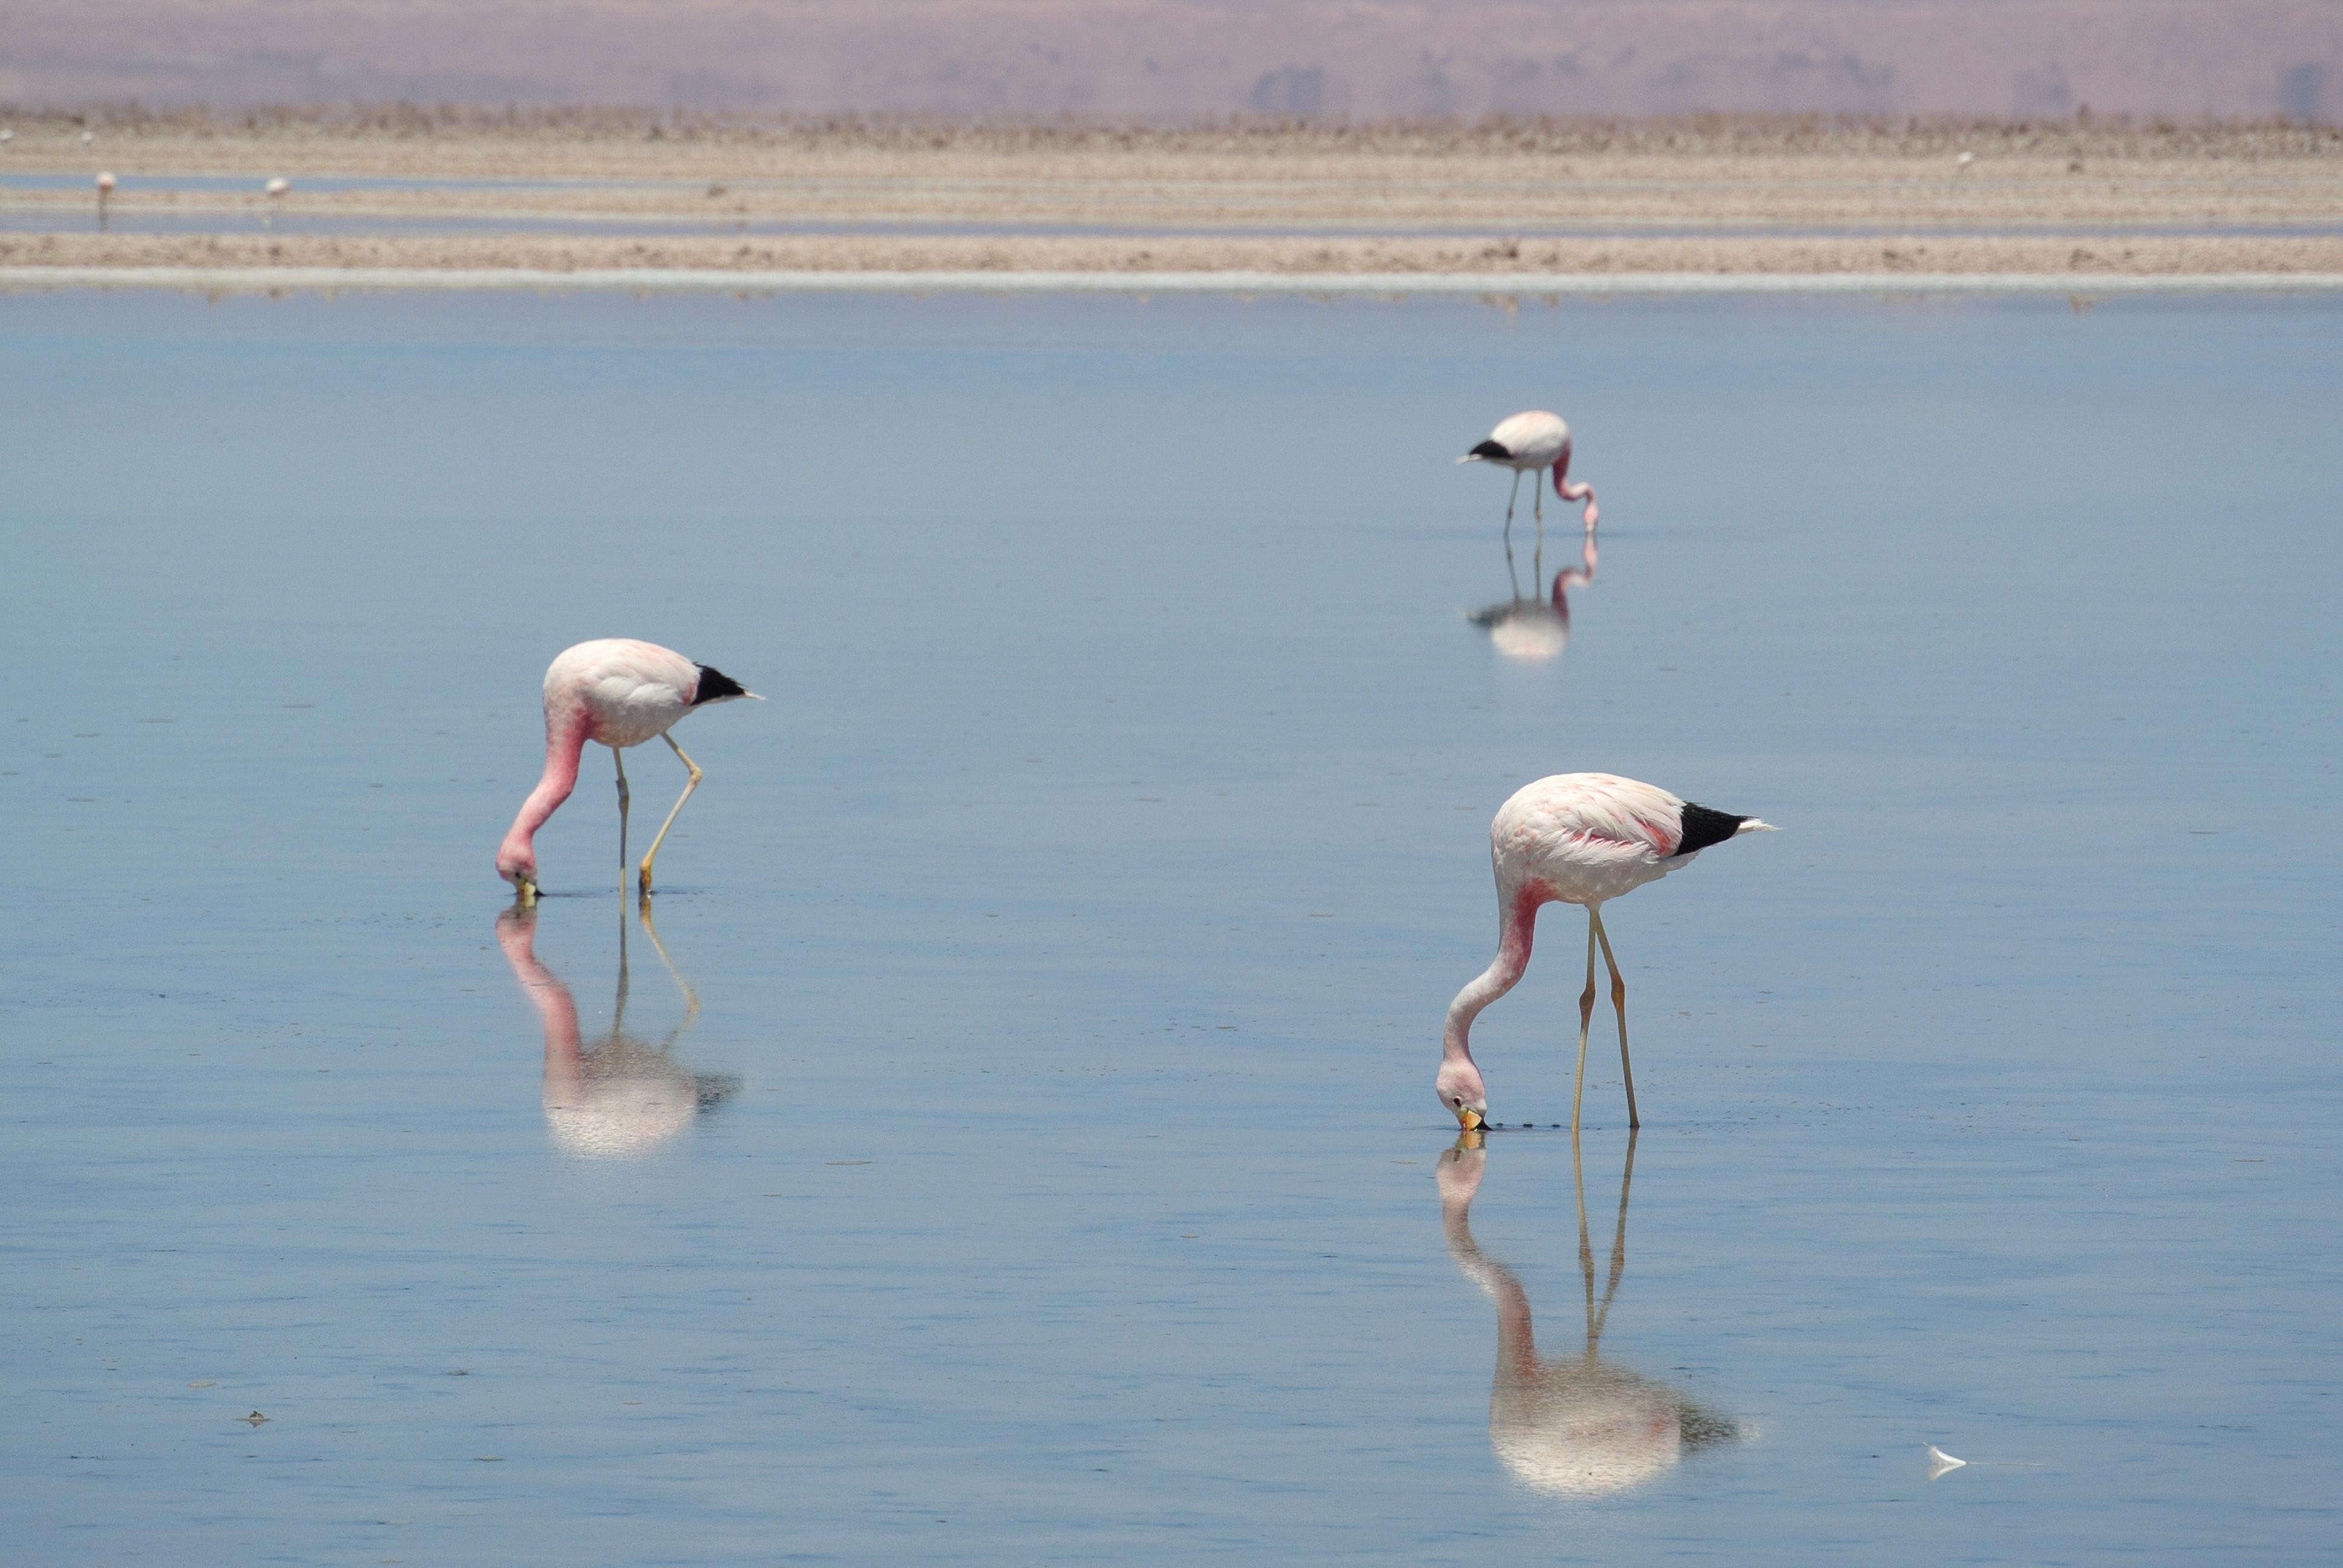 014 0912 Mirador - Salar de Atacama 29jpeg